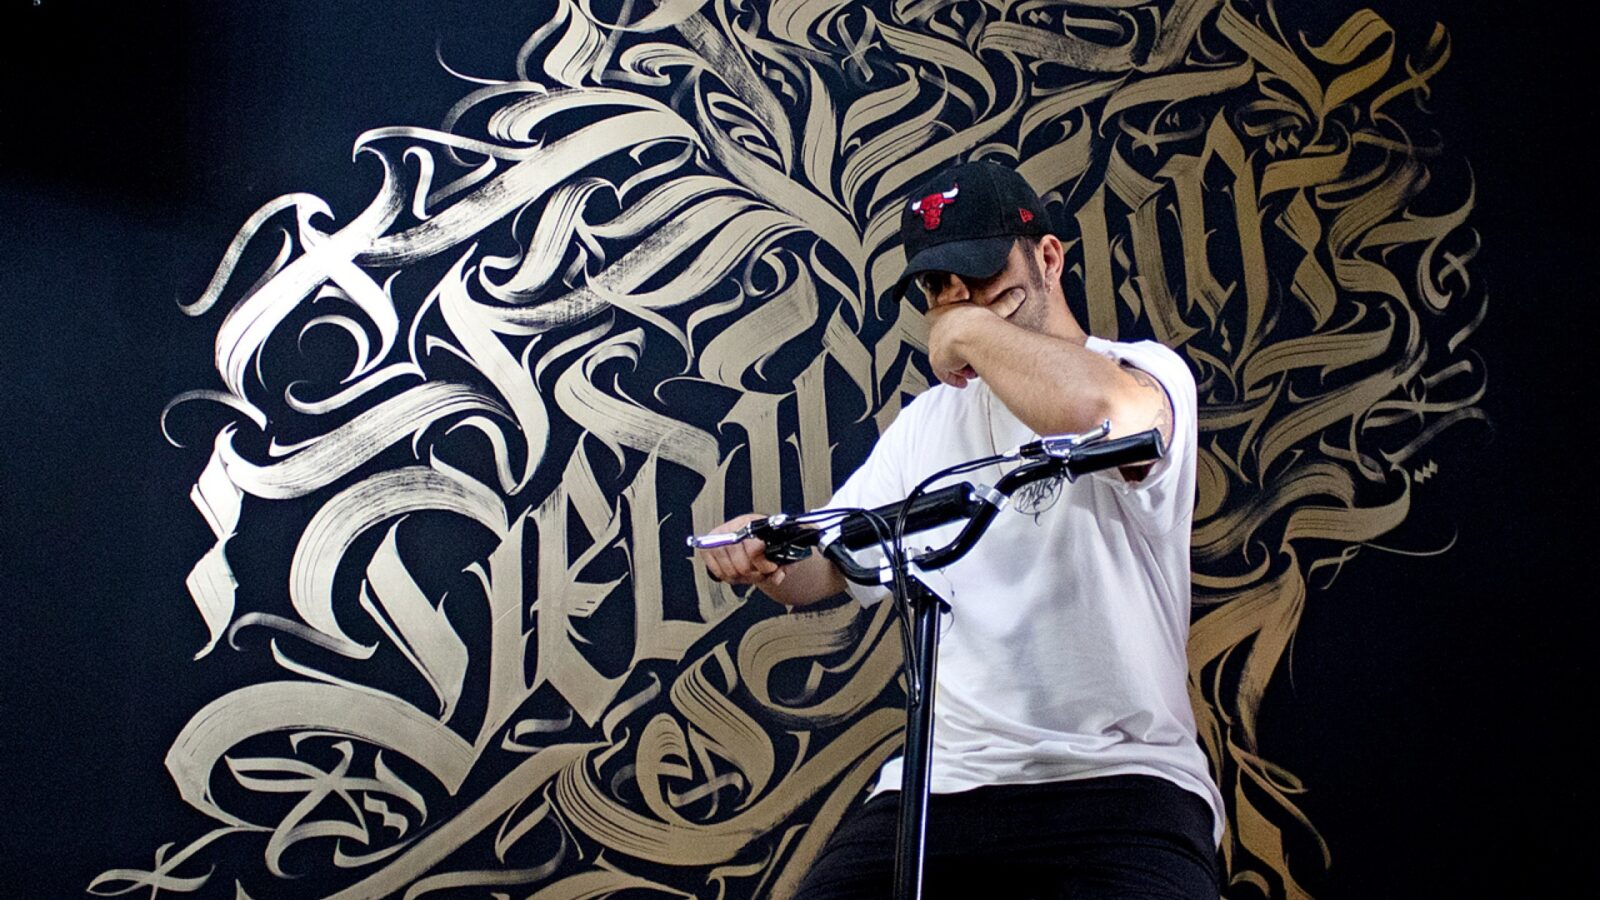 Warios Graffiti Interview